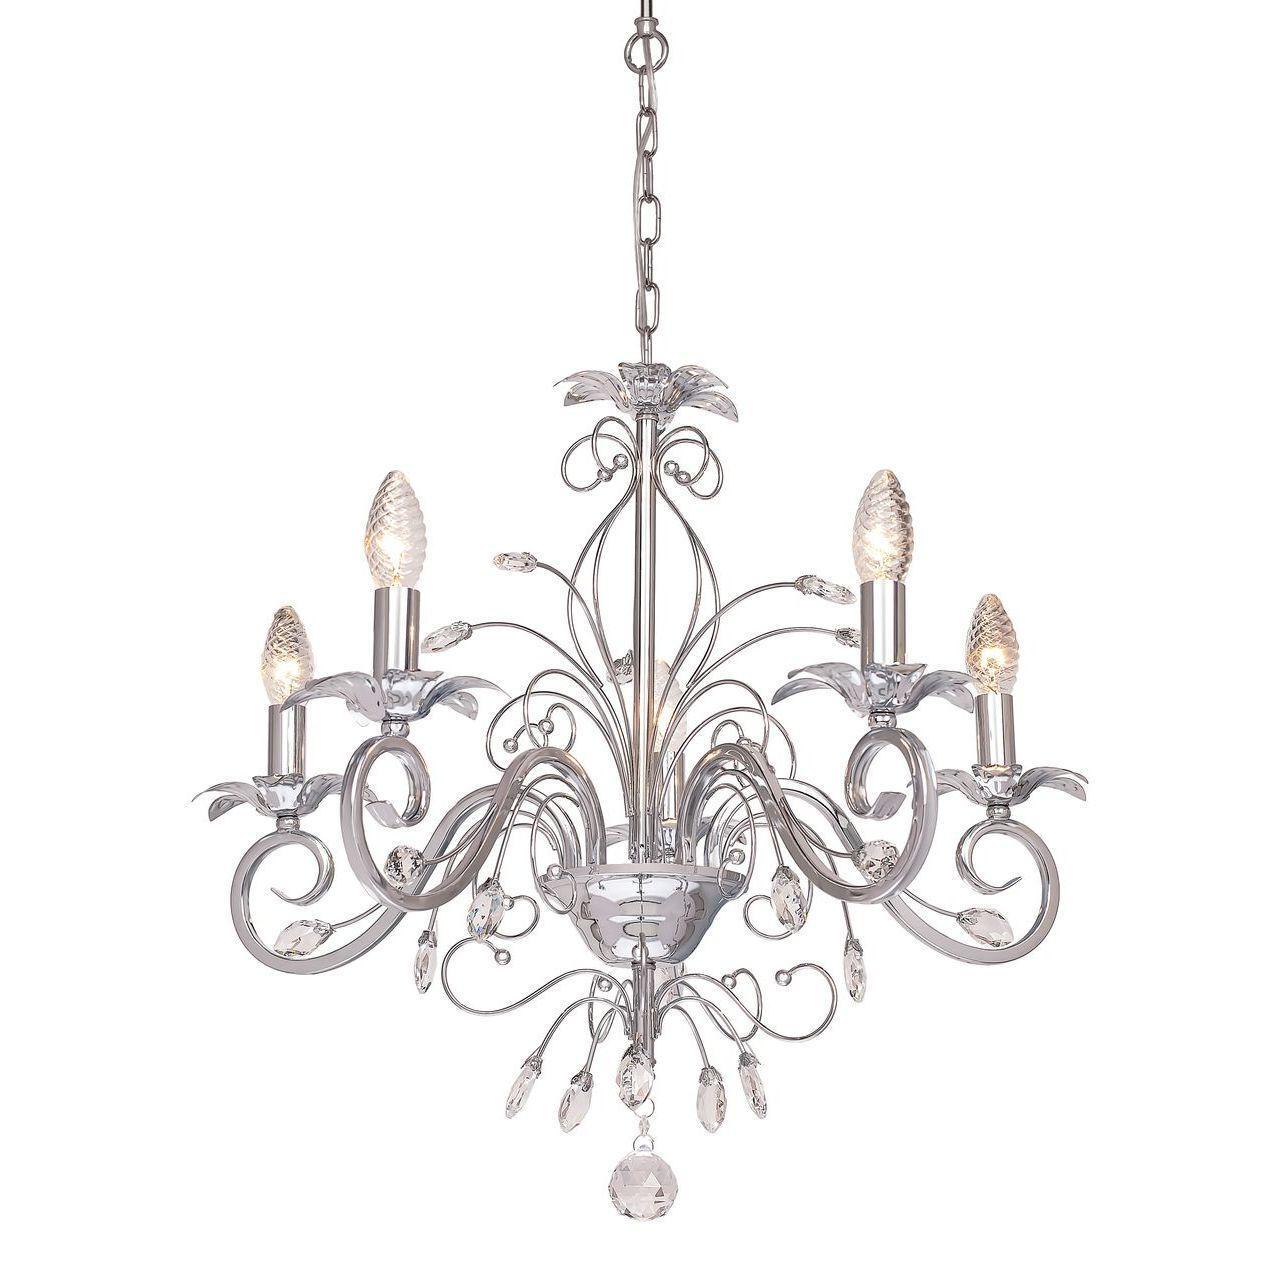 Люстра Silver Light Diana 725.54.5 подвесная silver light diana 508 43 1